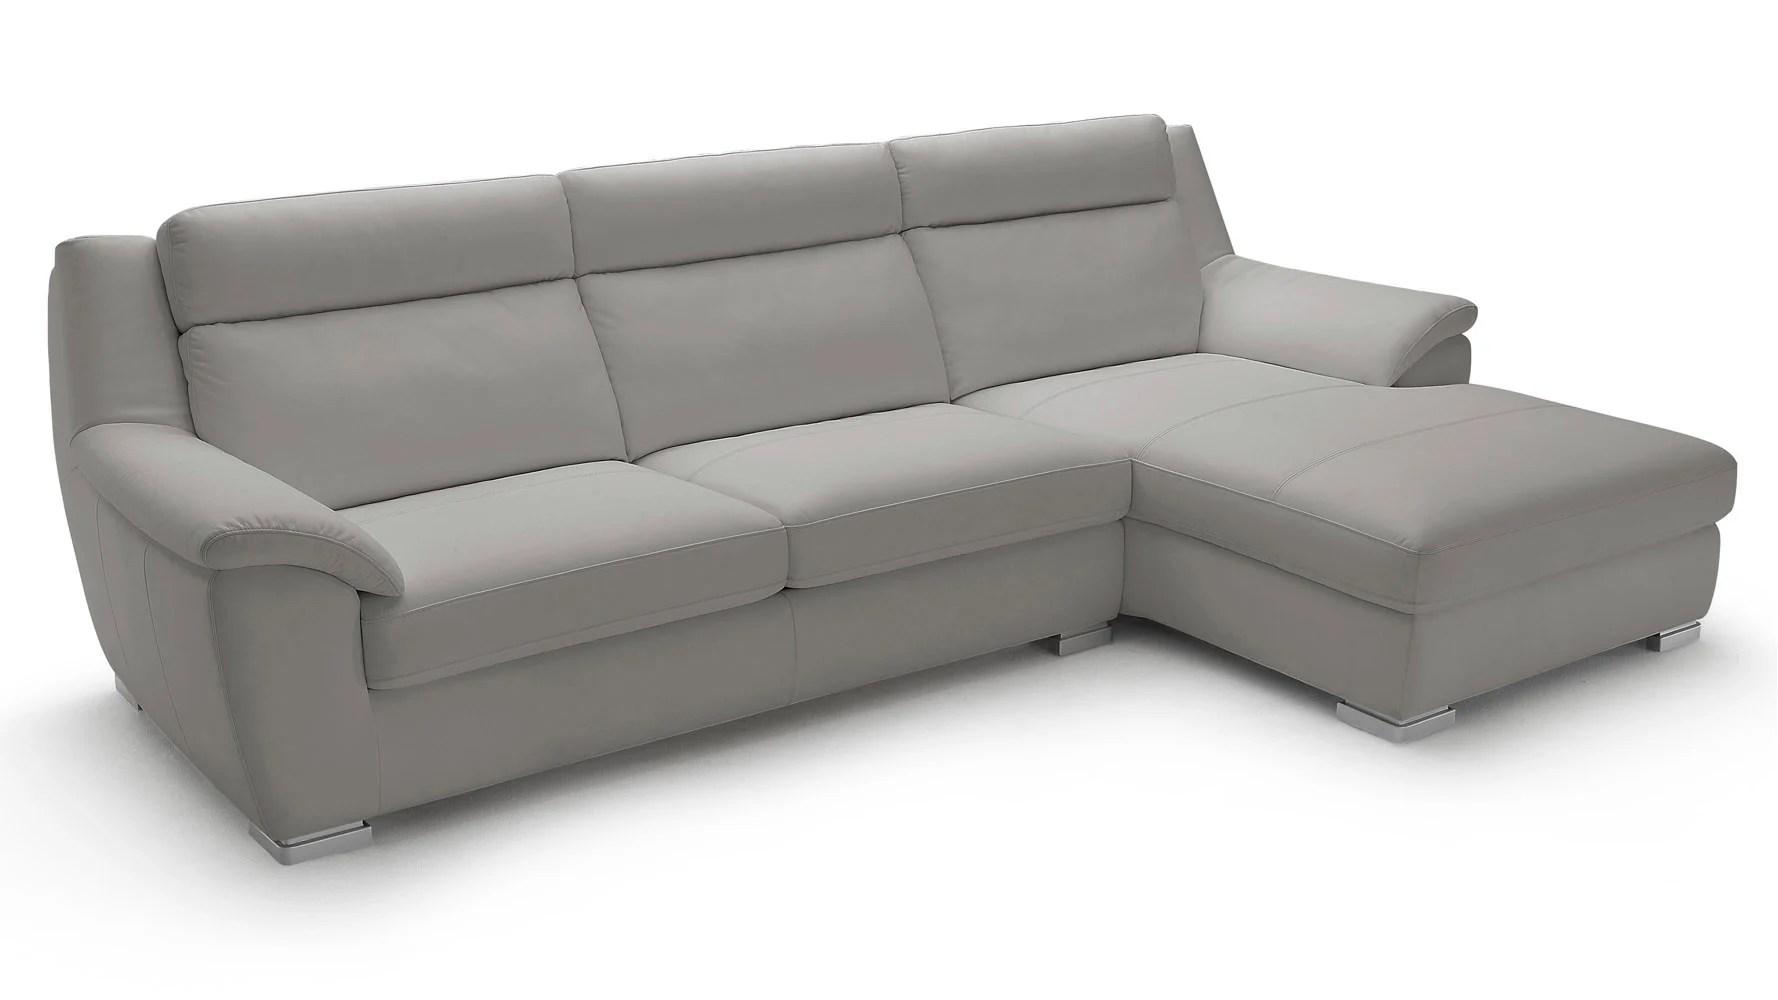 sleeper sofa charlotte nc white fabric cleaner havertys brown microfiber